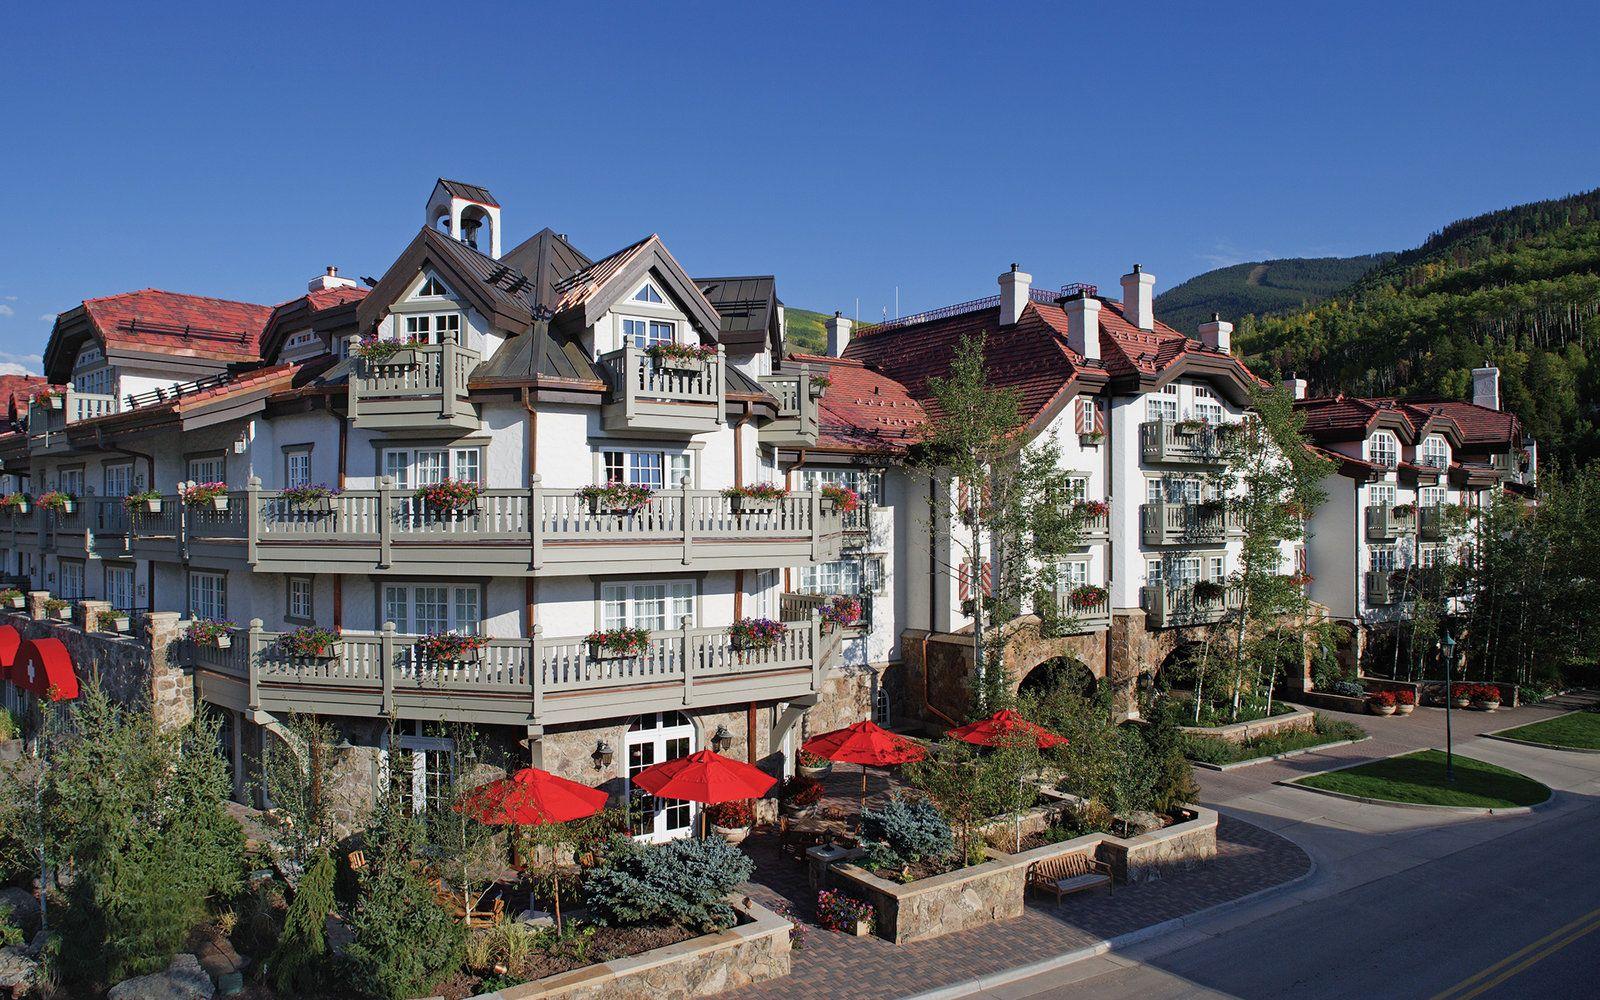 Sonnenalp Hotel Vail Colorado Score 95 04 More Information